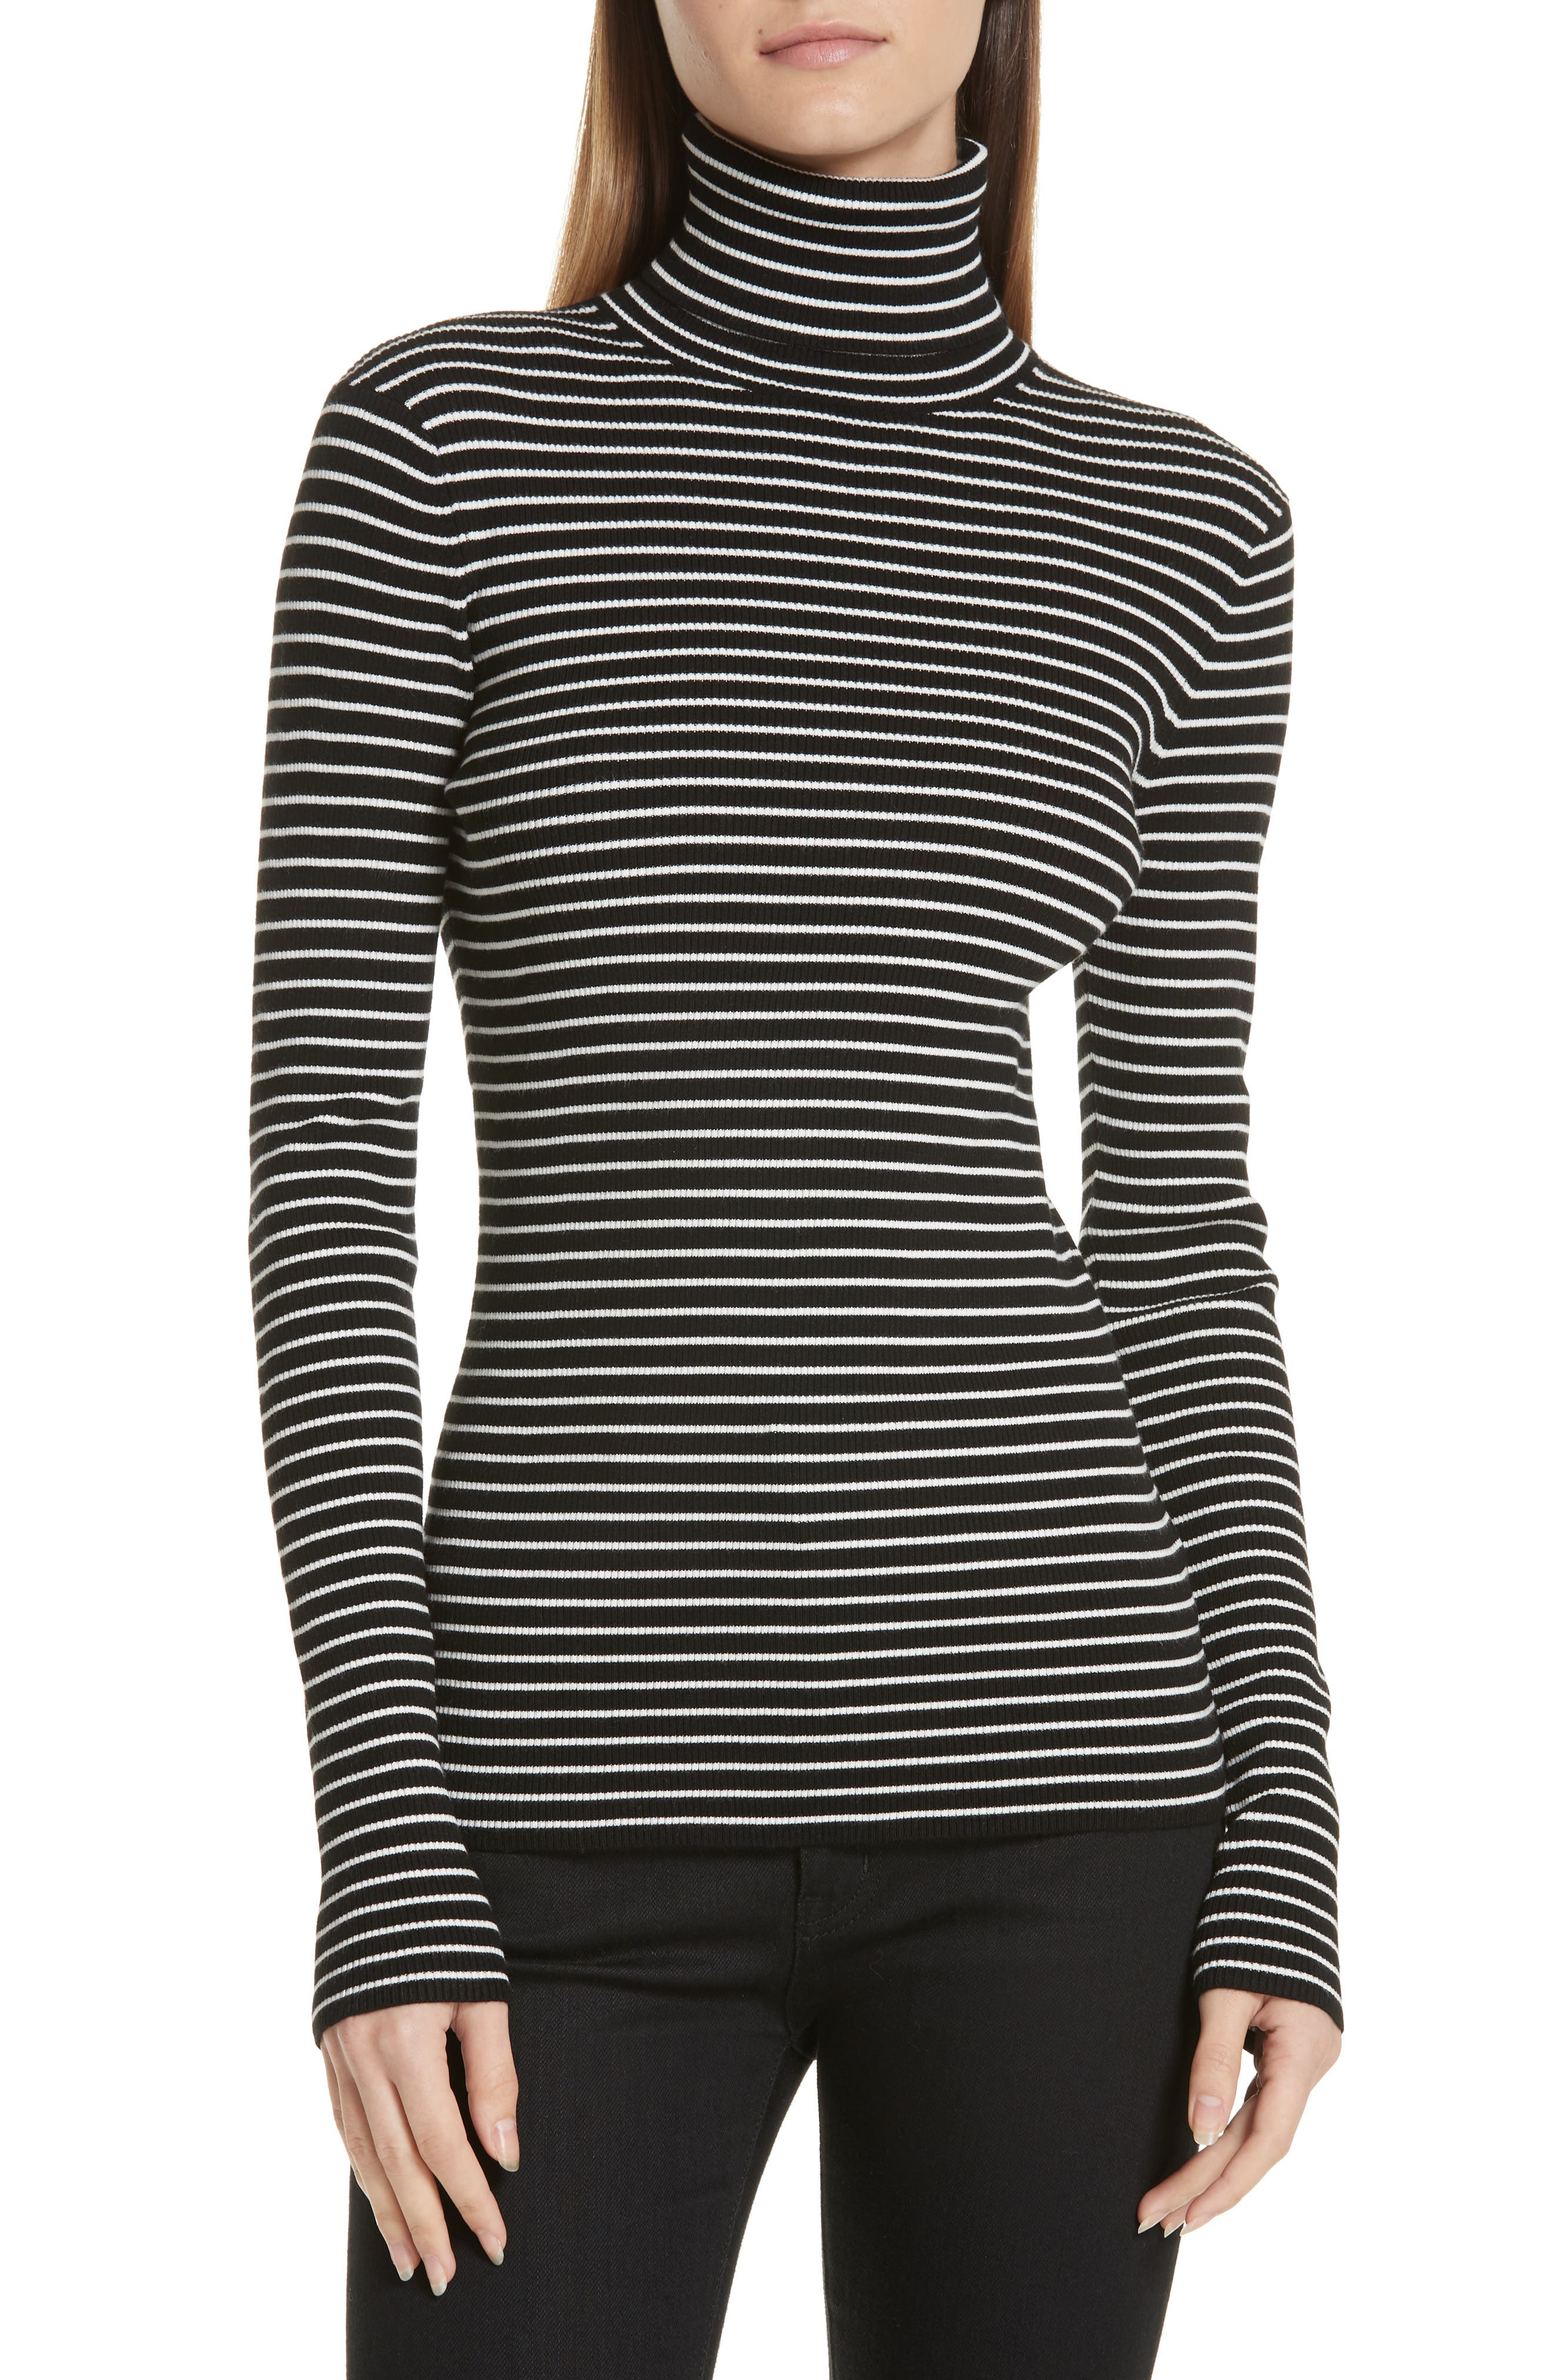 Fine Line Stripe Turtleneck,                             Main thumbnail 1, color,                             BLACK AND WHITE STRIPES